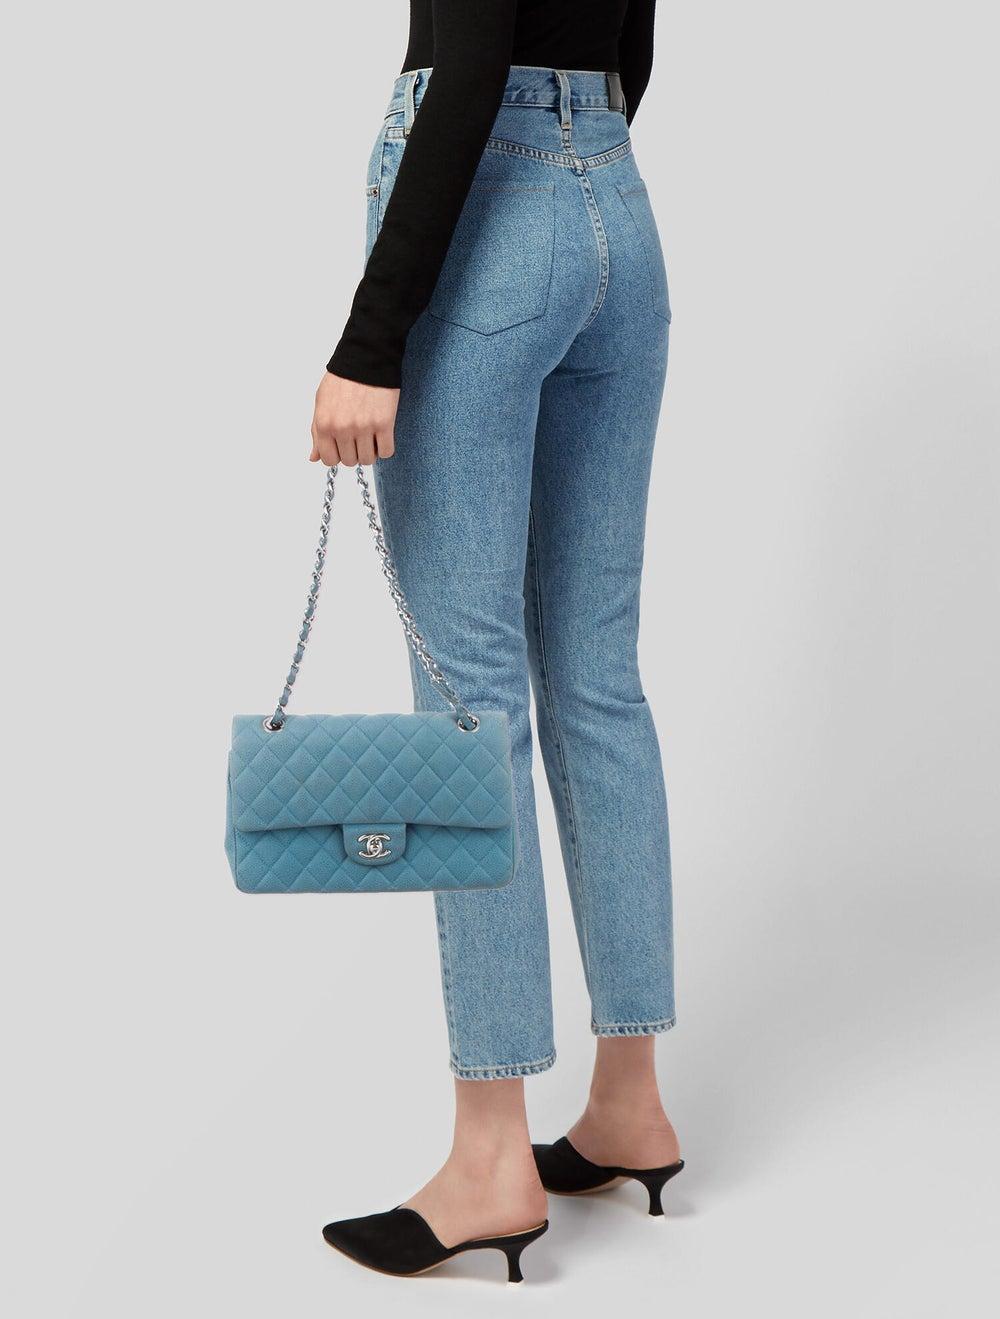 Chanel Nubuck Medium Classic Double Flap Bag Blue - image 2